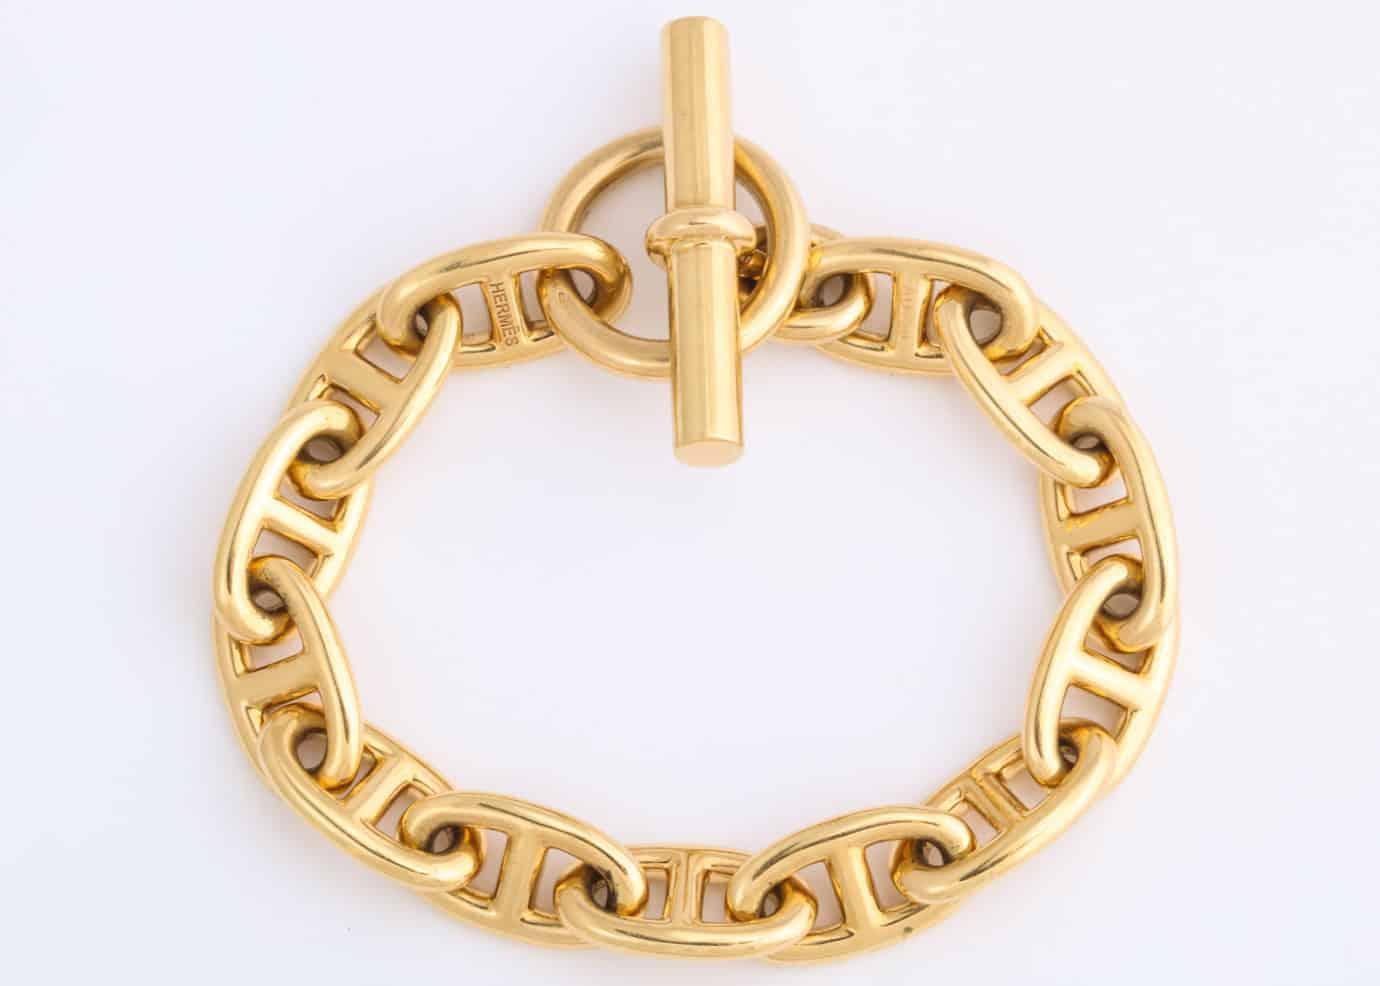 hermes 18k gold smooth link chaine d'ancre bracelet